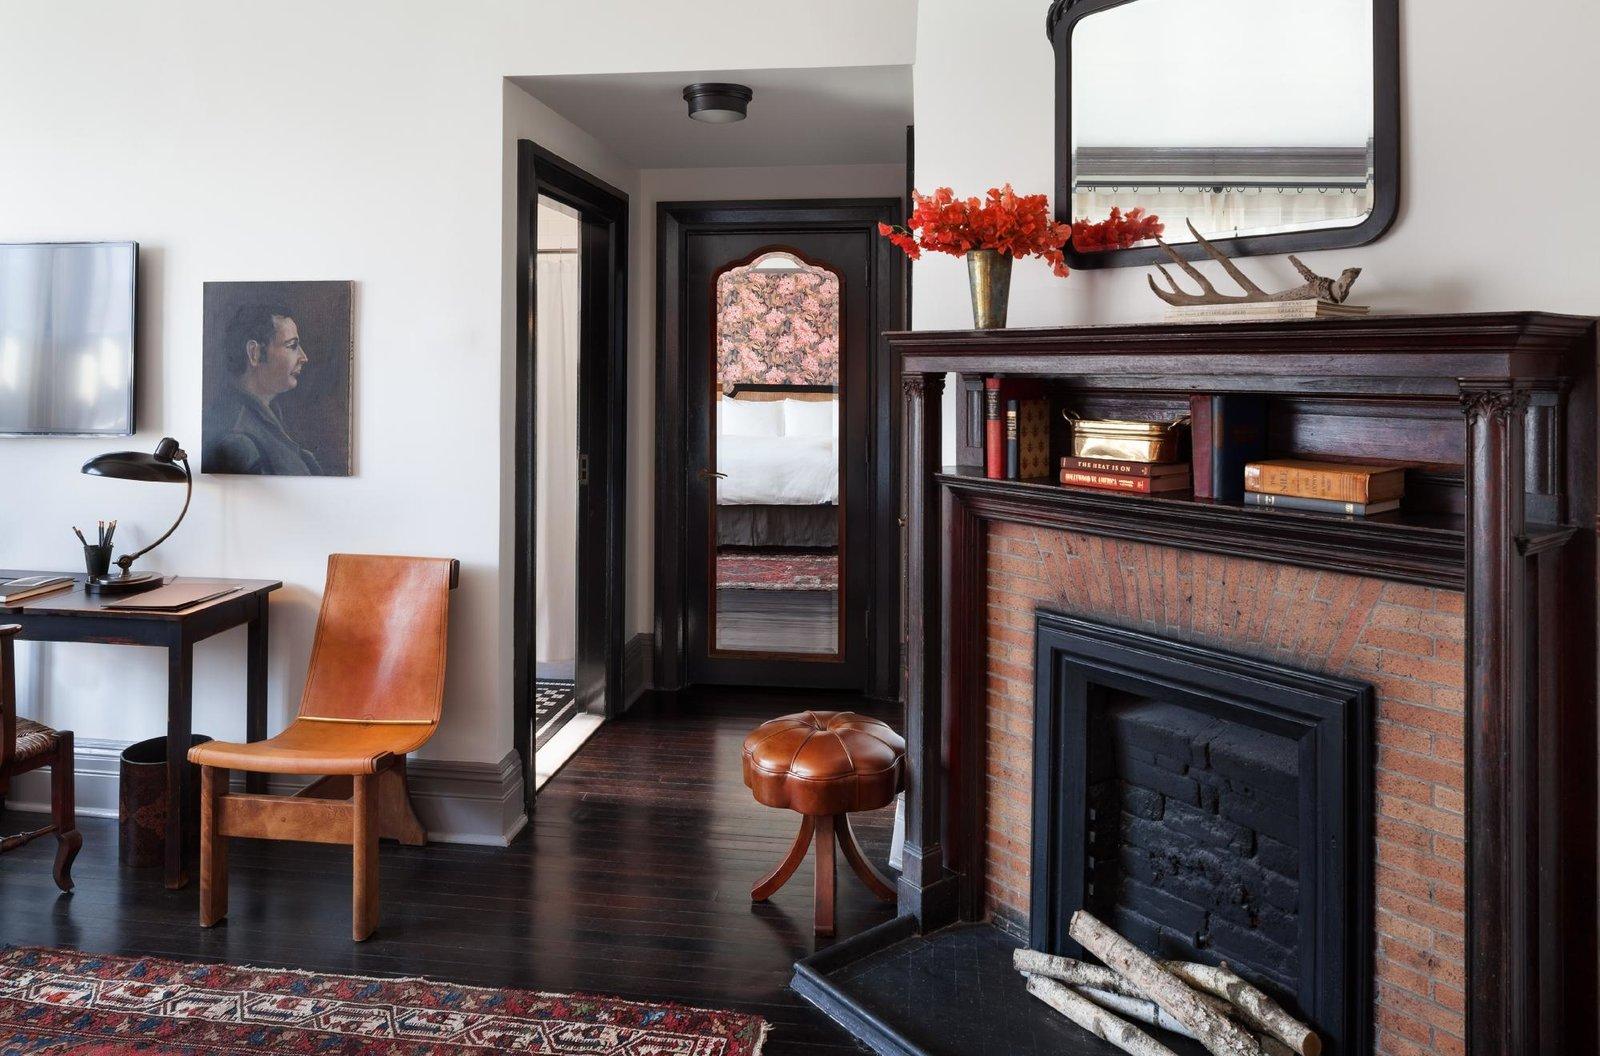 Living Room, Lamps, Dark Hardwood Floor, Table Lighting, Rug Floor, Desk, Chair, Stools, and Corner Fireplace  The High Line Hotel